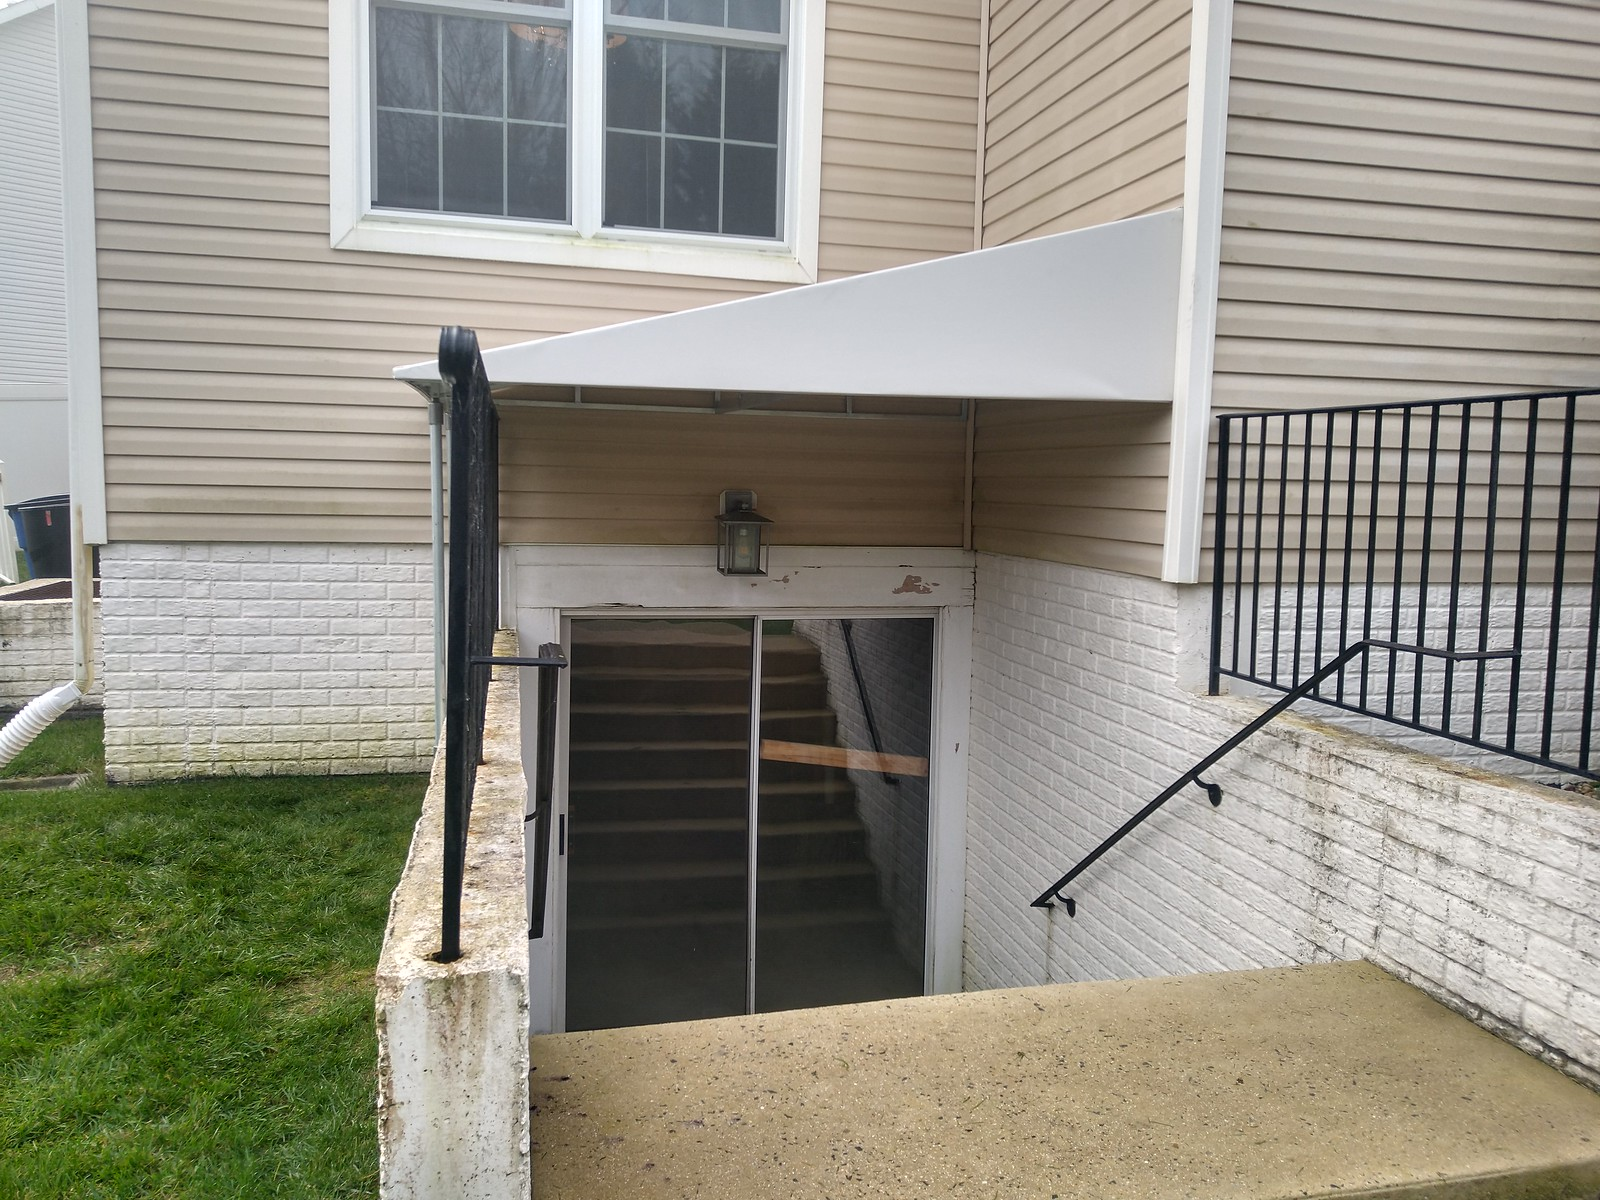 Stair-Well-Awning - Baltimore-Hoffman Awning